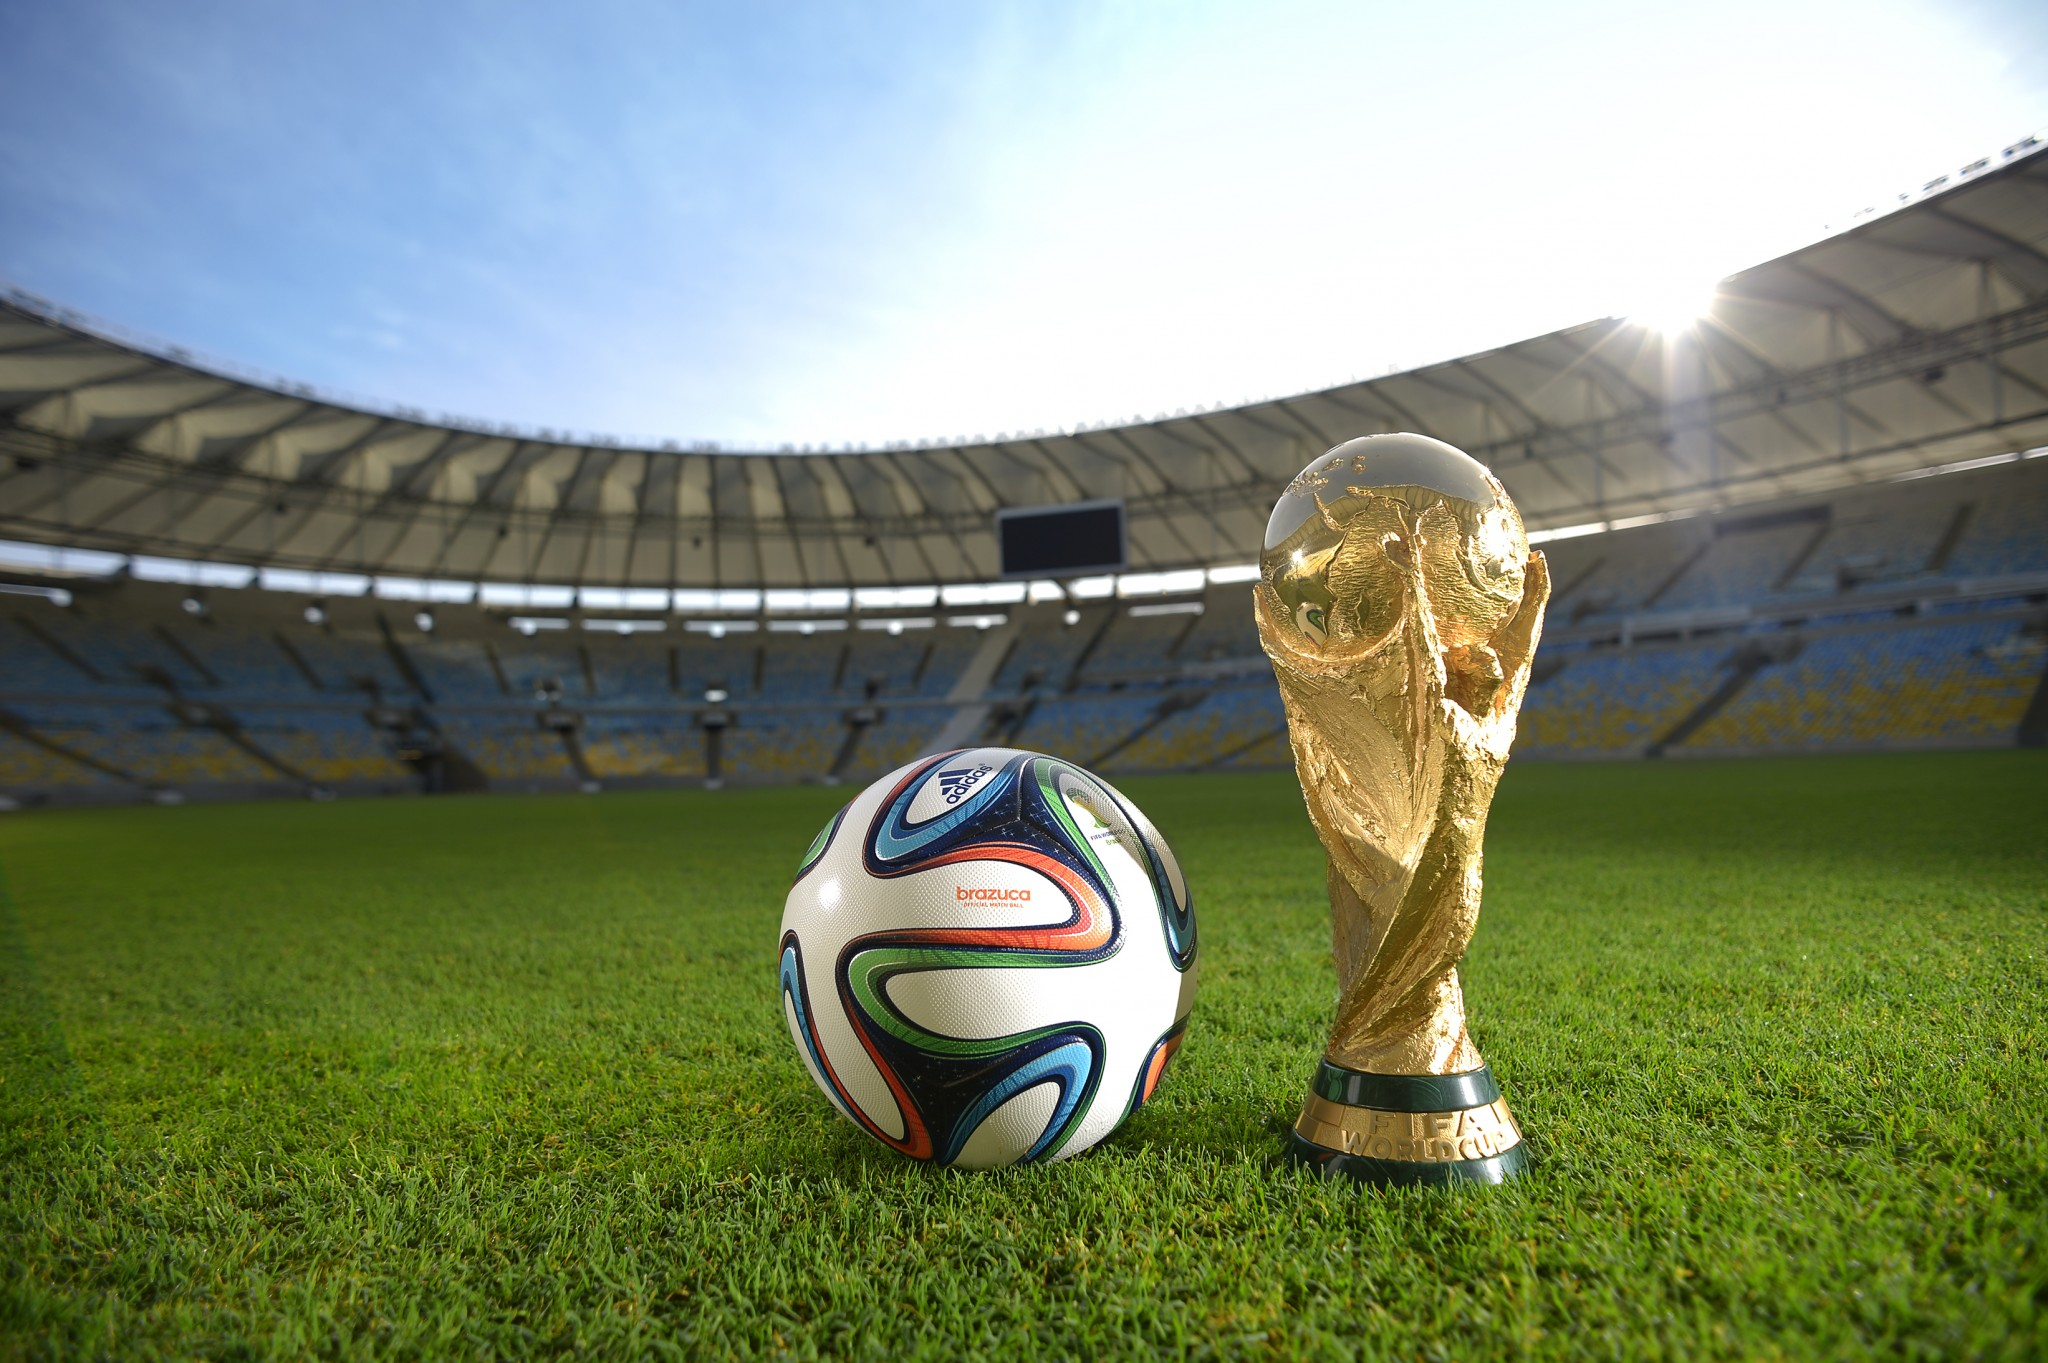 FIFA World Cup Brasil 2014 Trophy